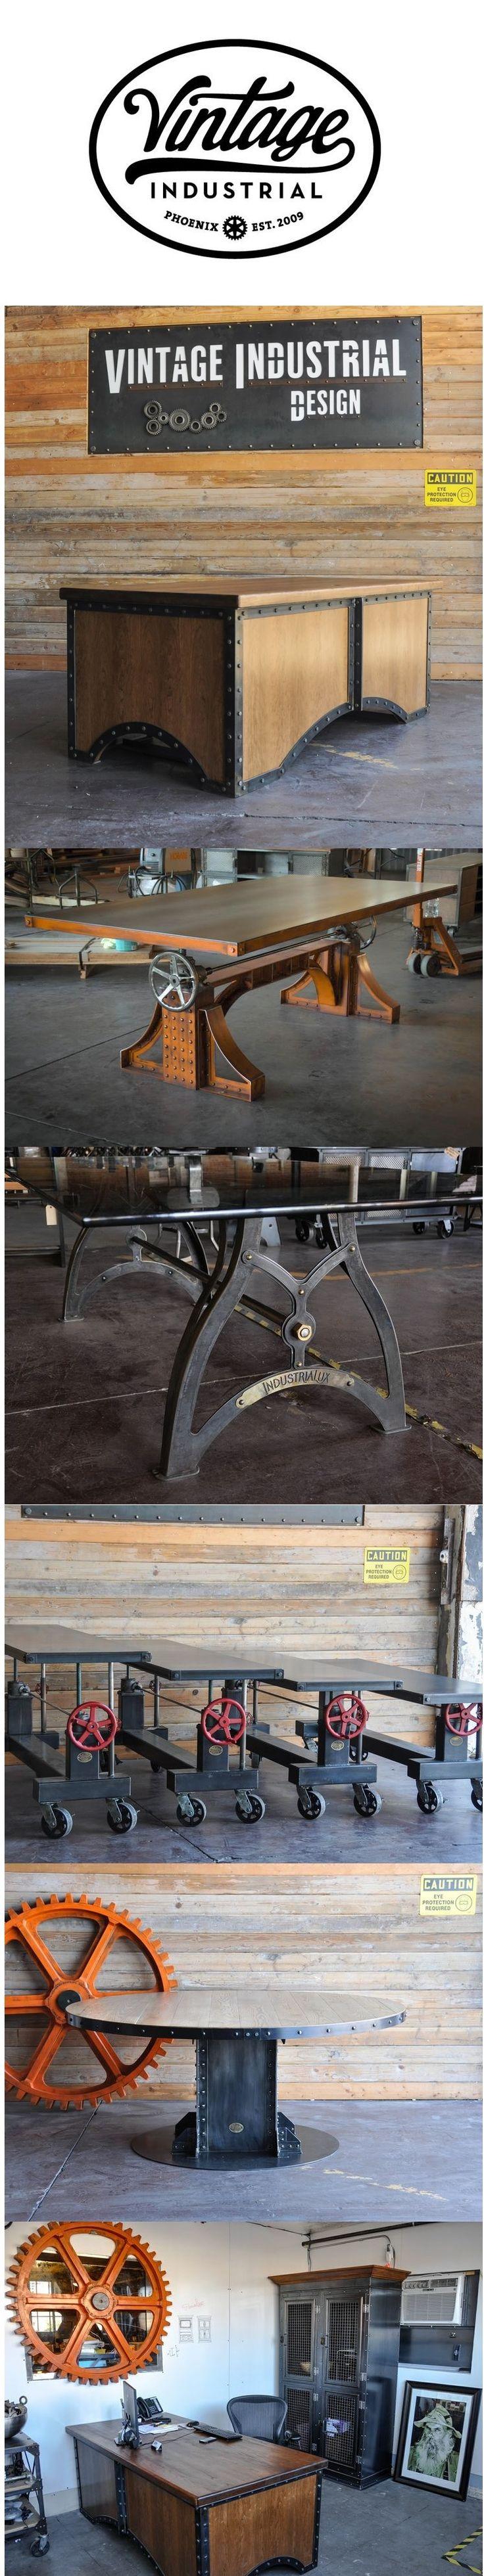 25+ best vintage industrial decor ideas on pinterest | edison bulb